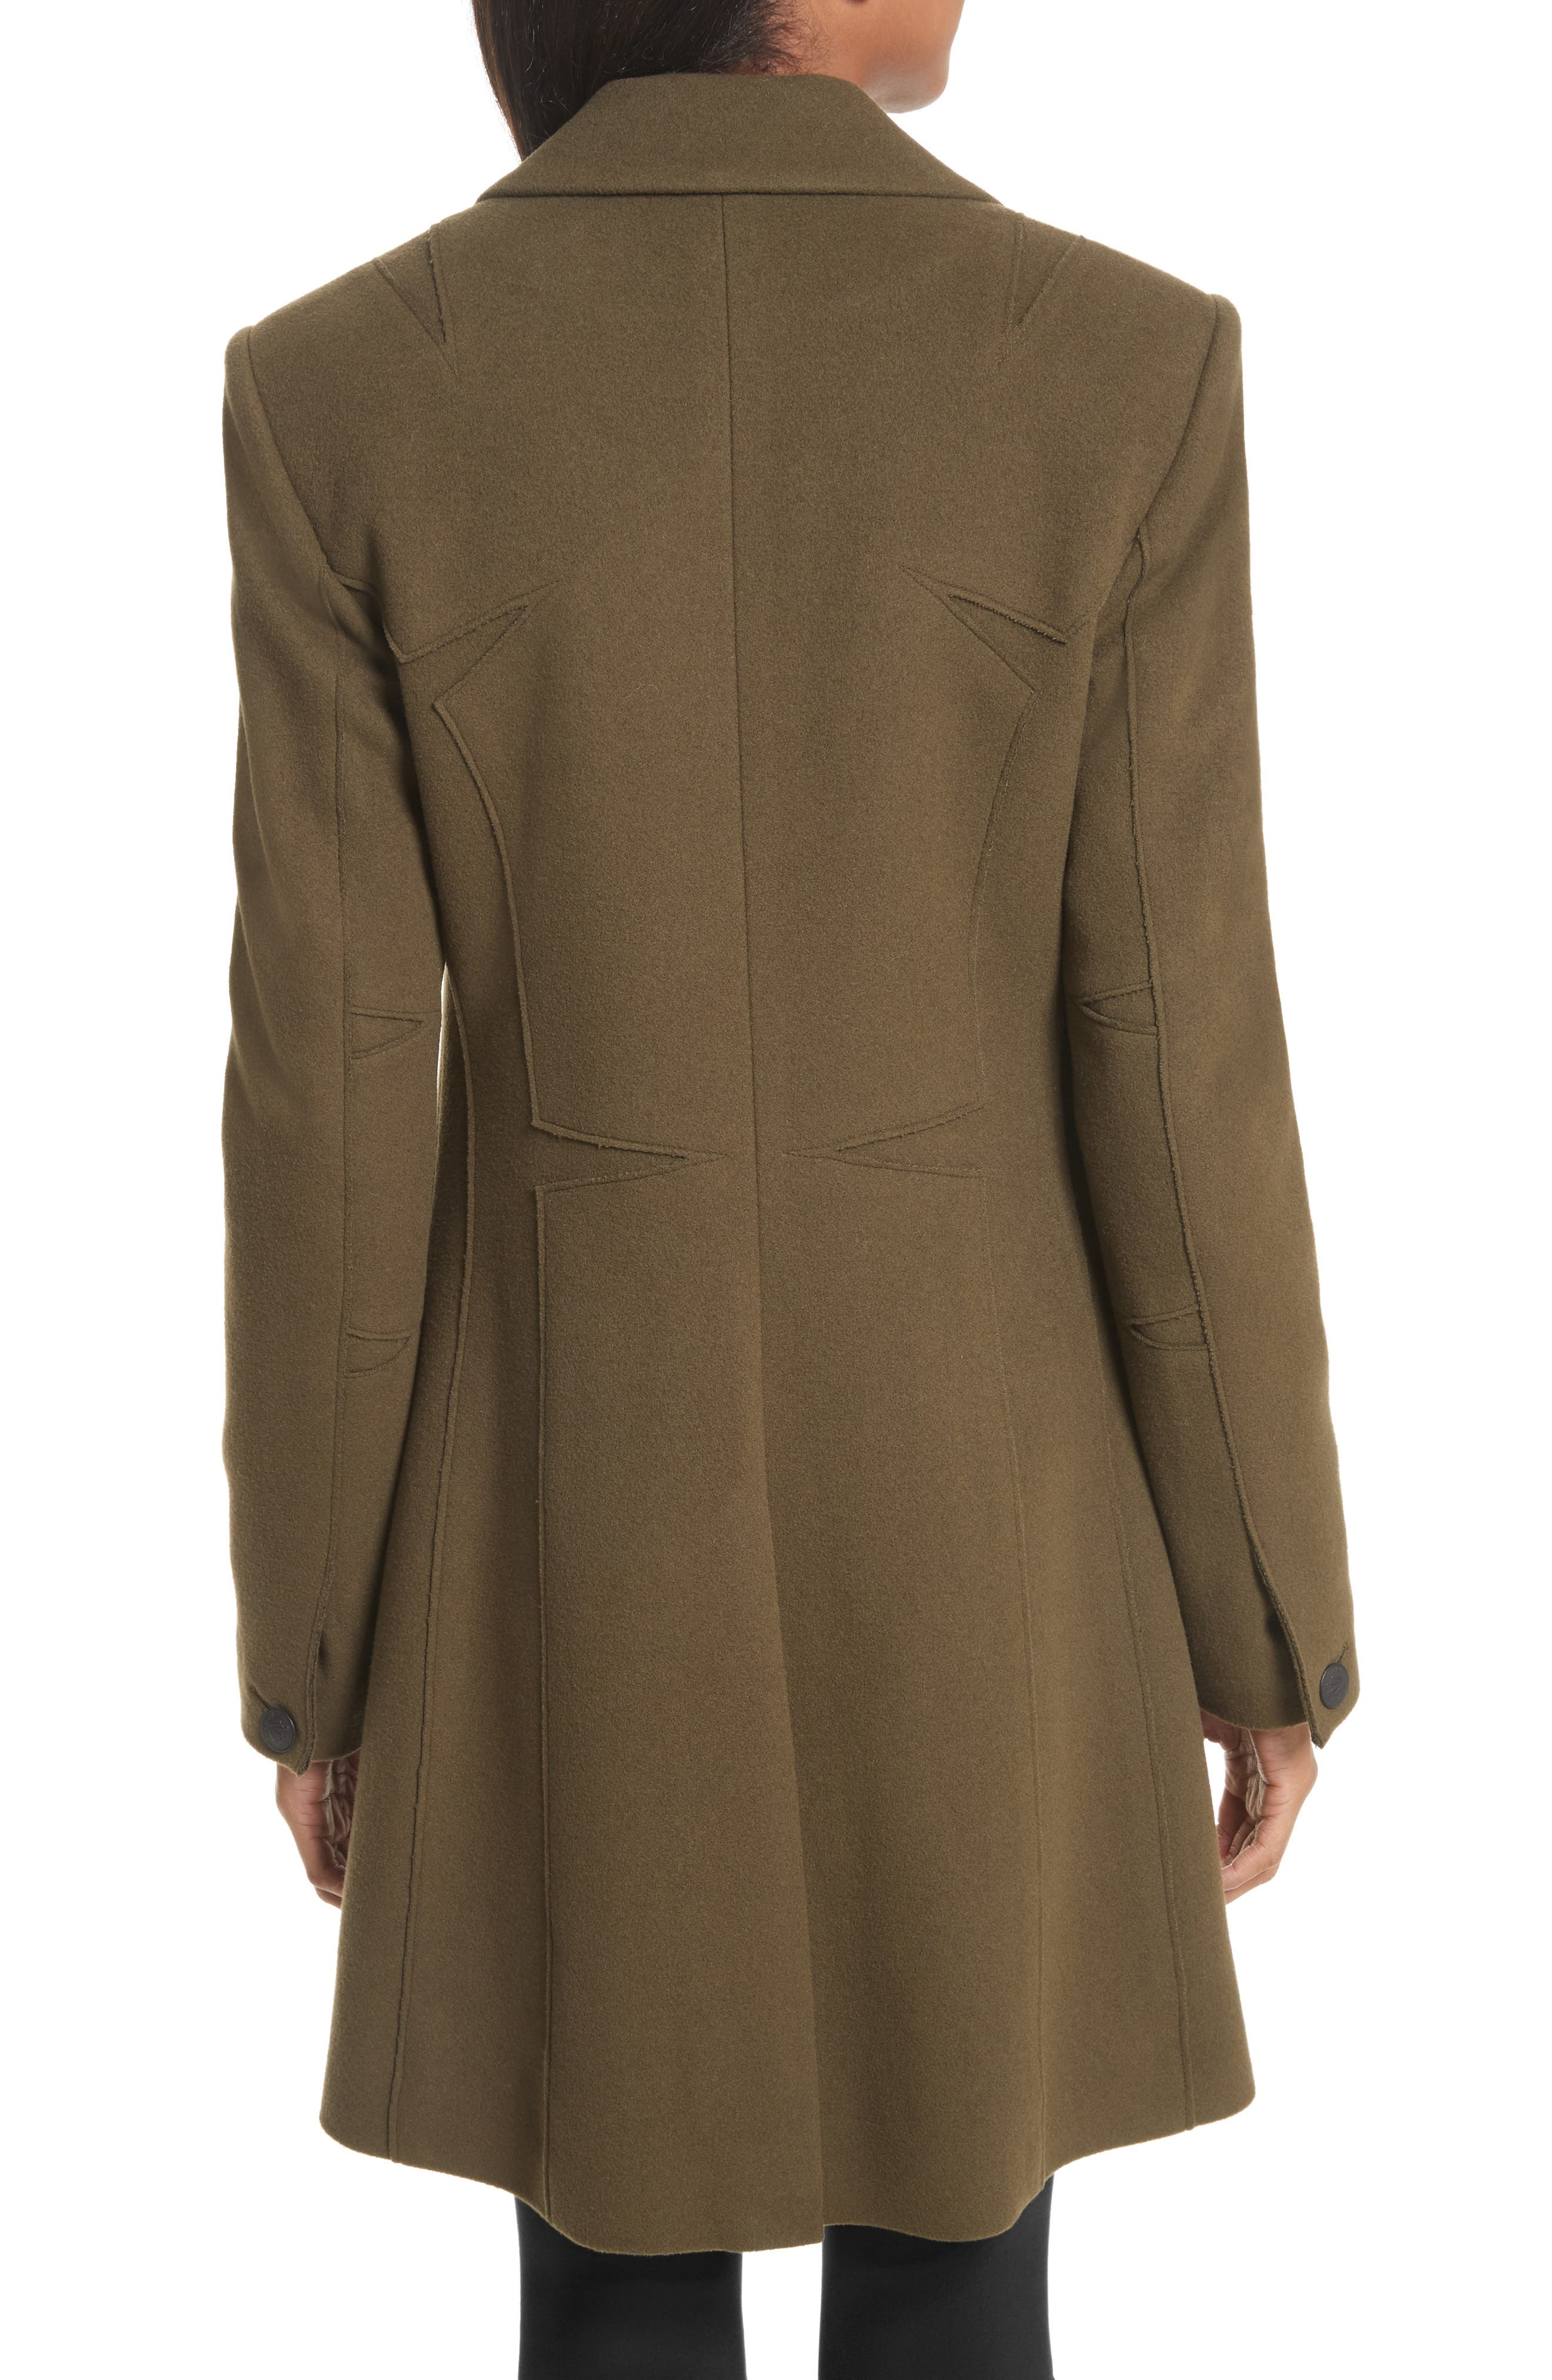 Duchess Wool Blend Coat,                             Alternate thumbnail 2, color,                             325